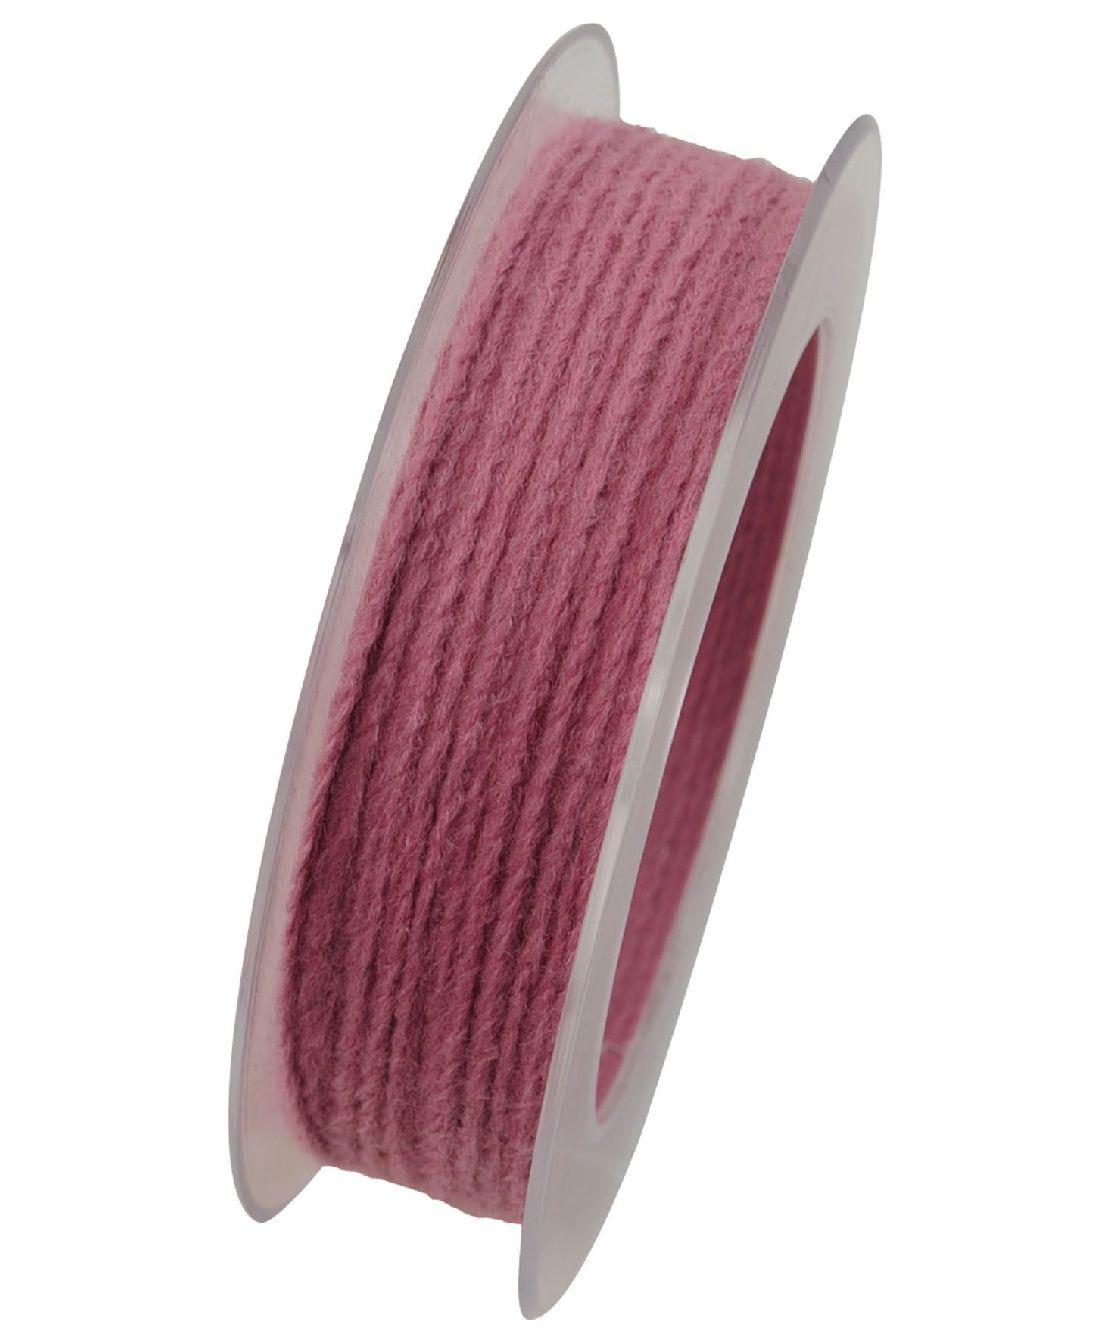 Wollkordel Twist mit Draht ALTROSA 5109 2mm  50 Meter  Wollschnur